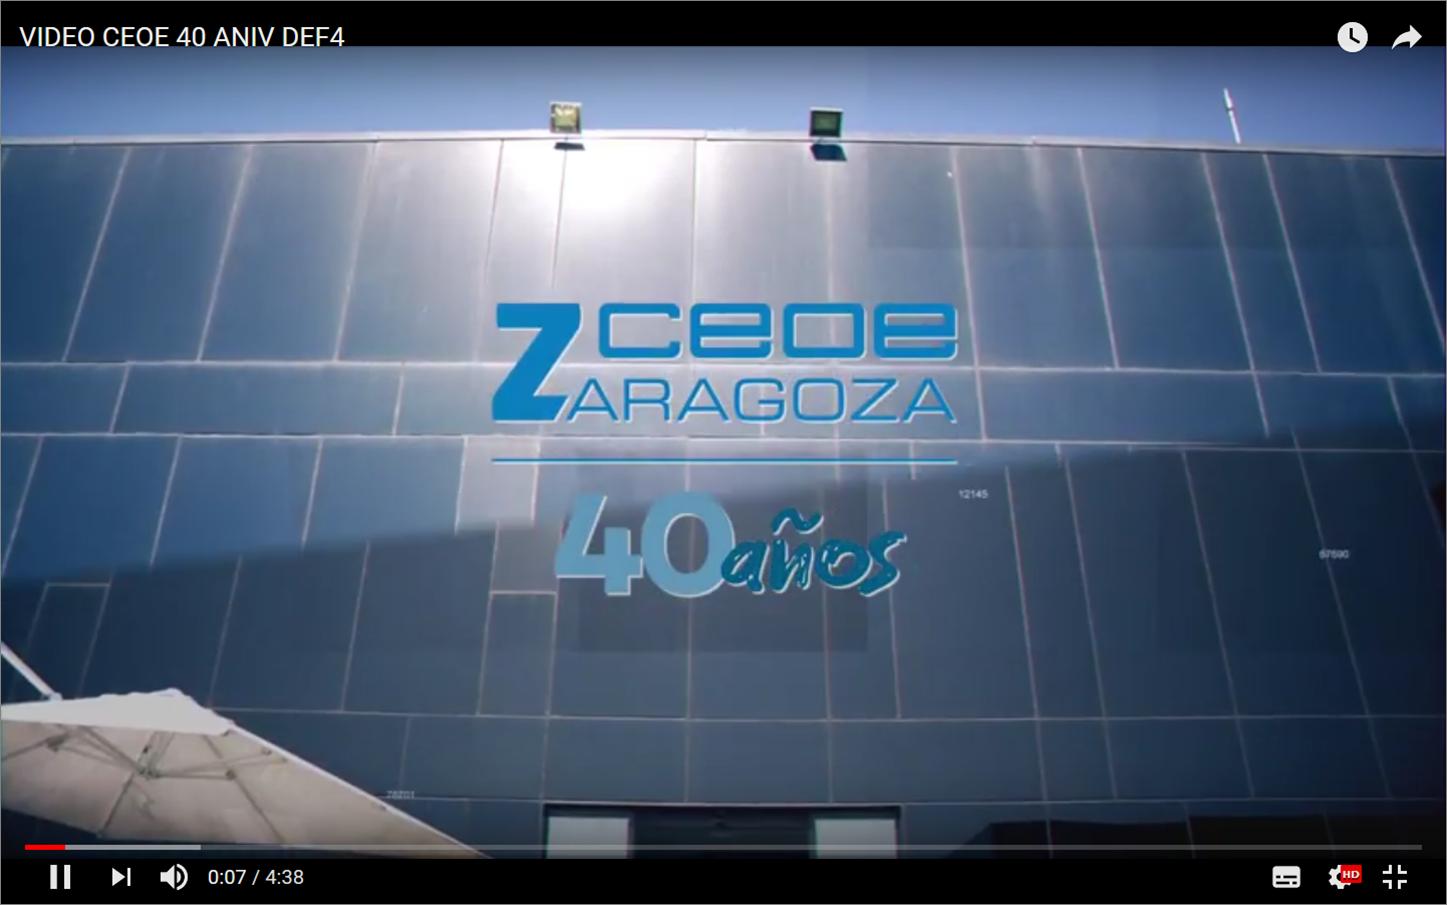 video ceoezgz 40